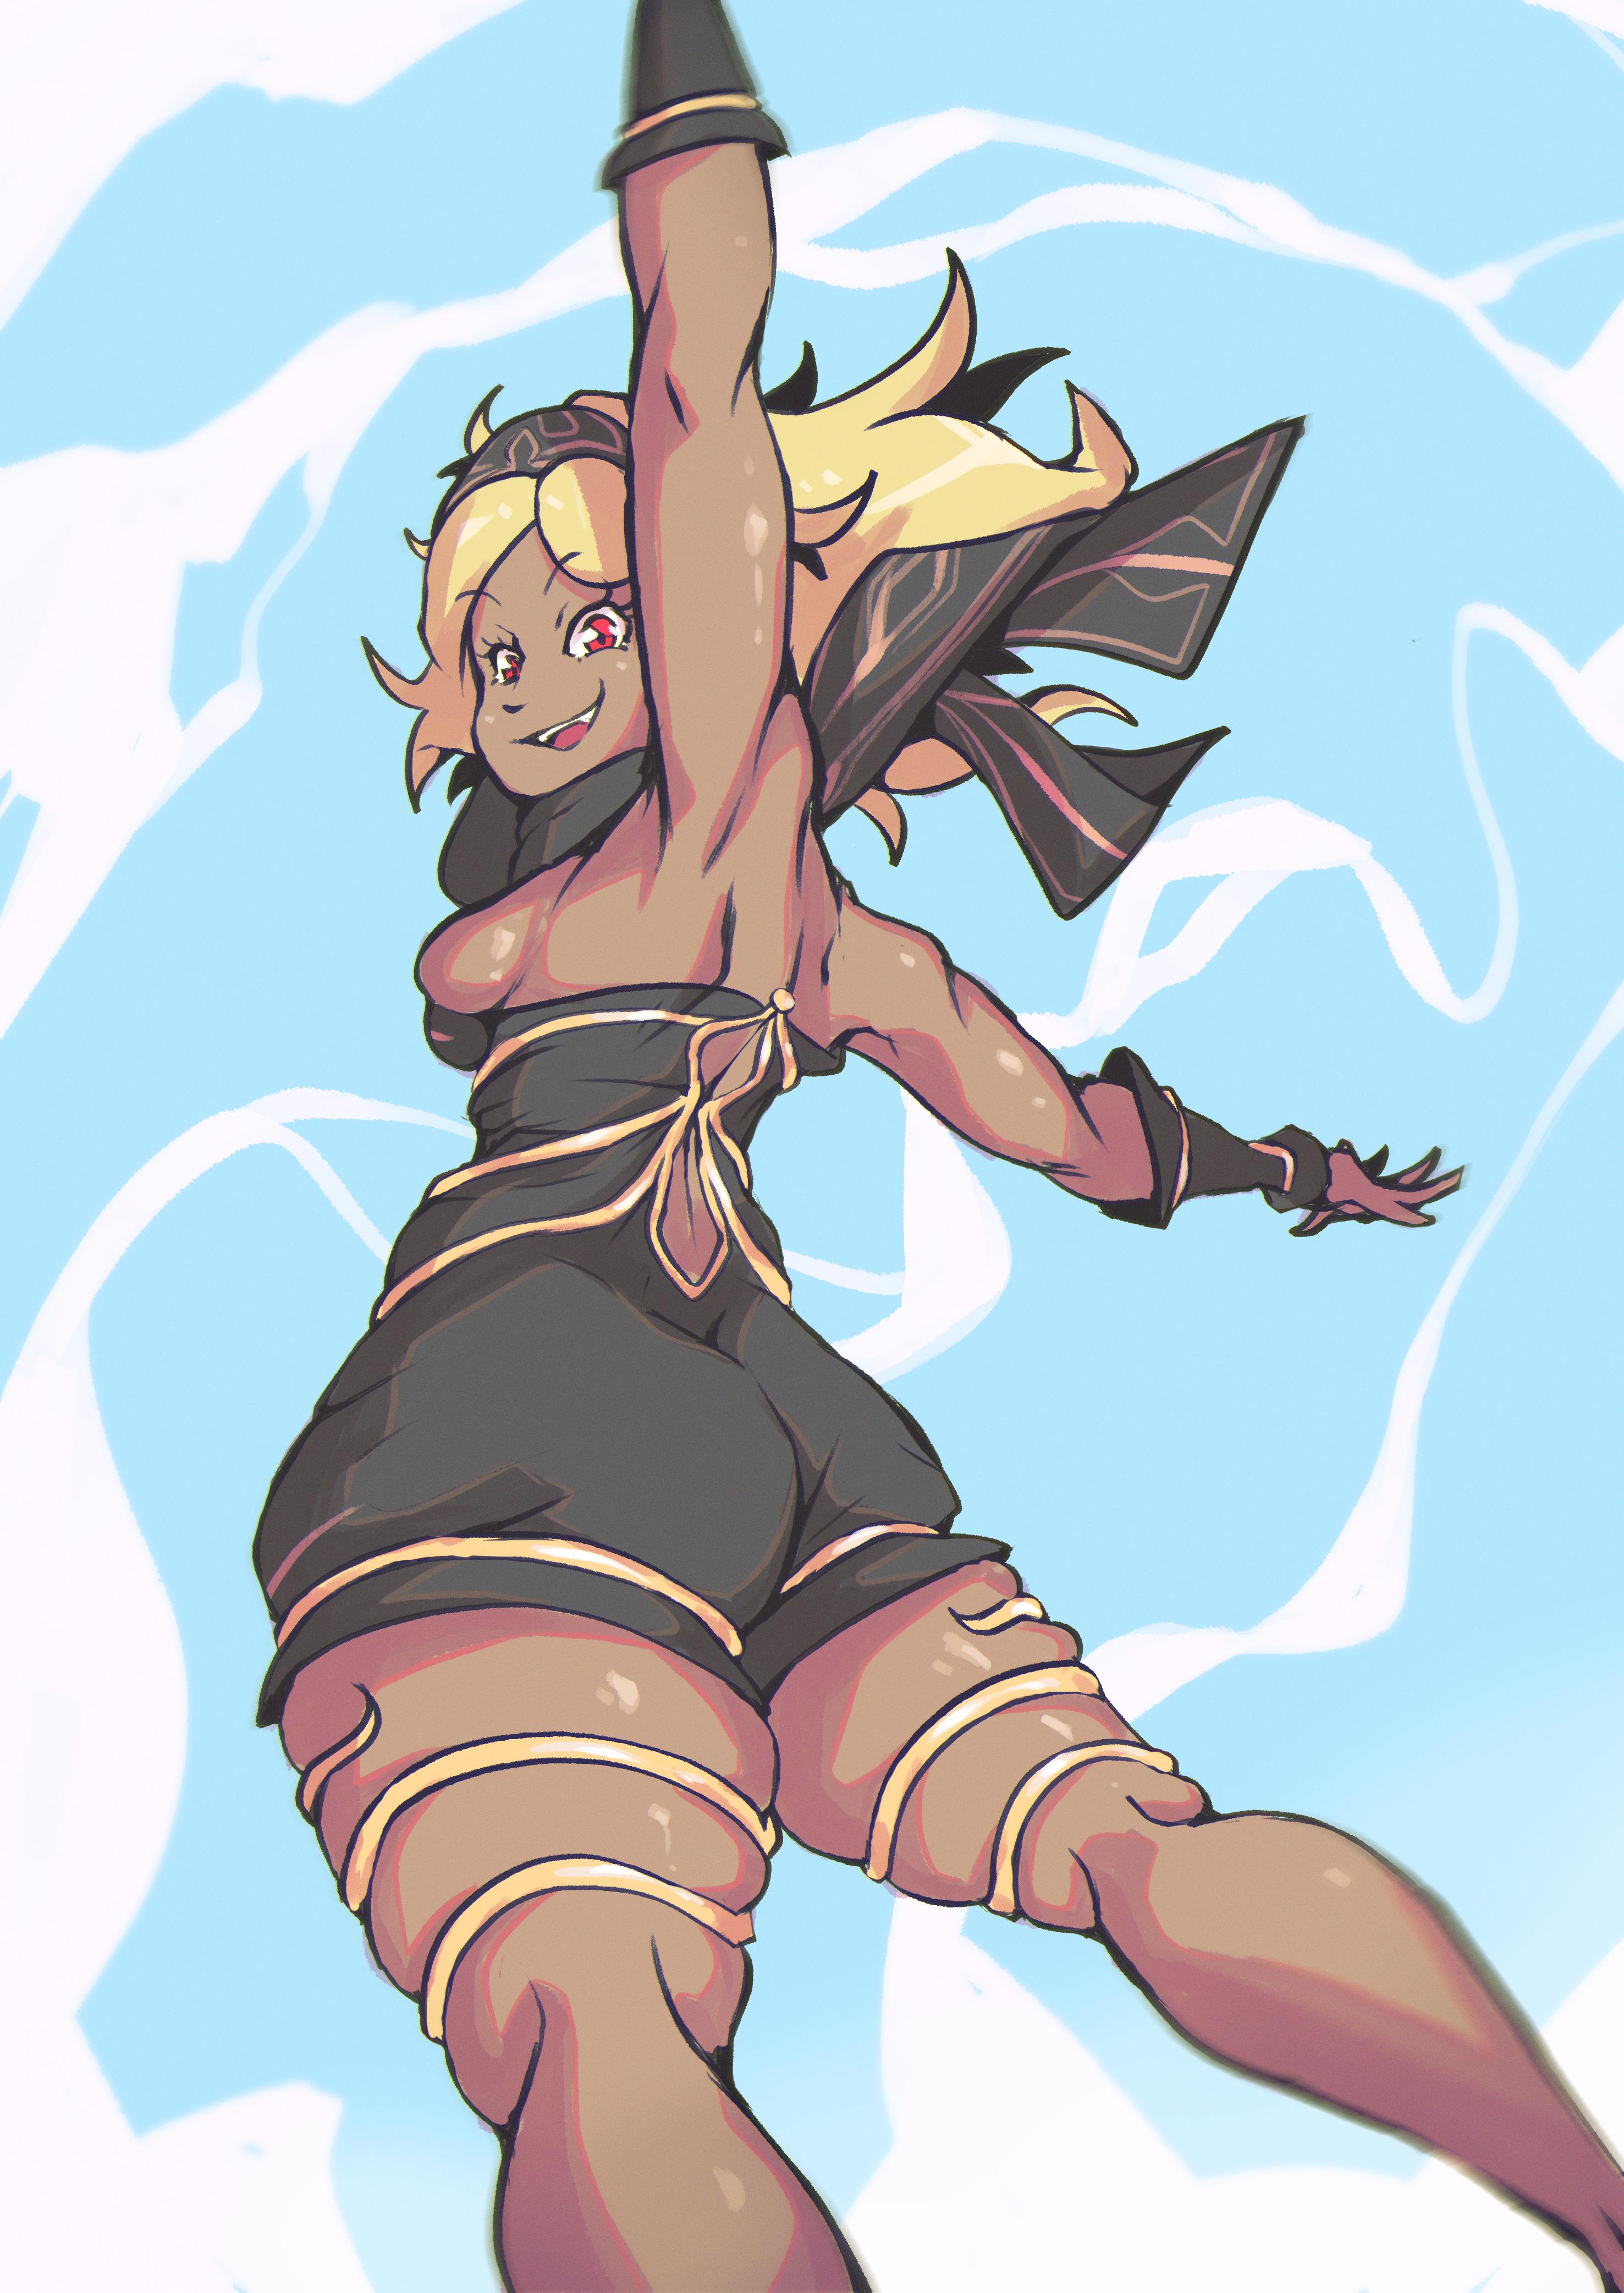 Kat Freefall